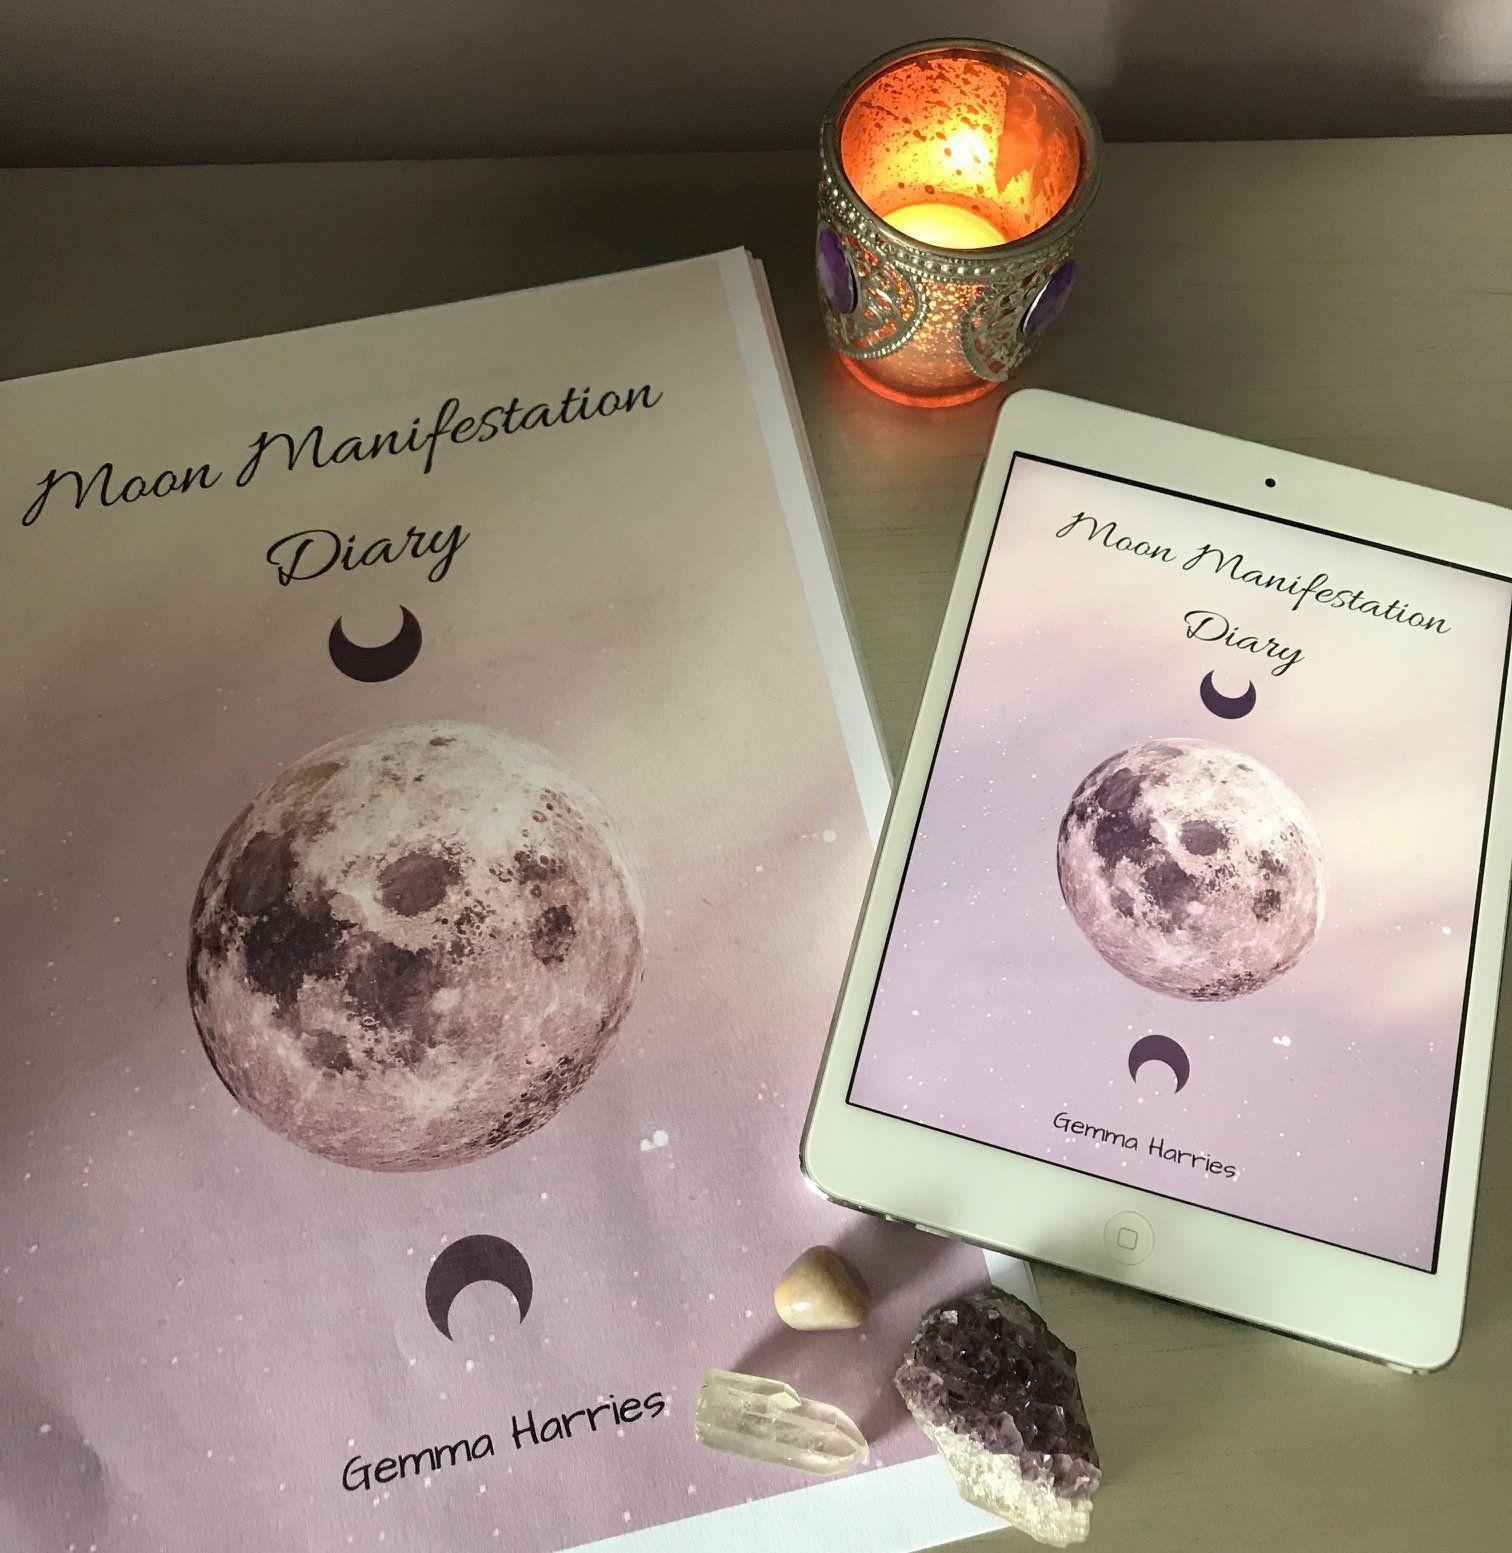 The Moon Manifestation Diary